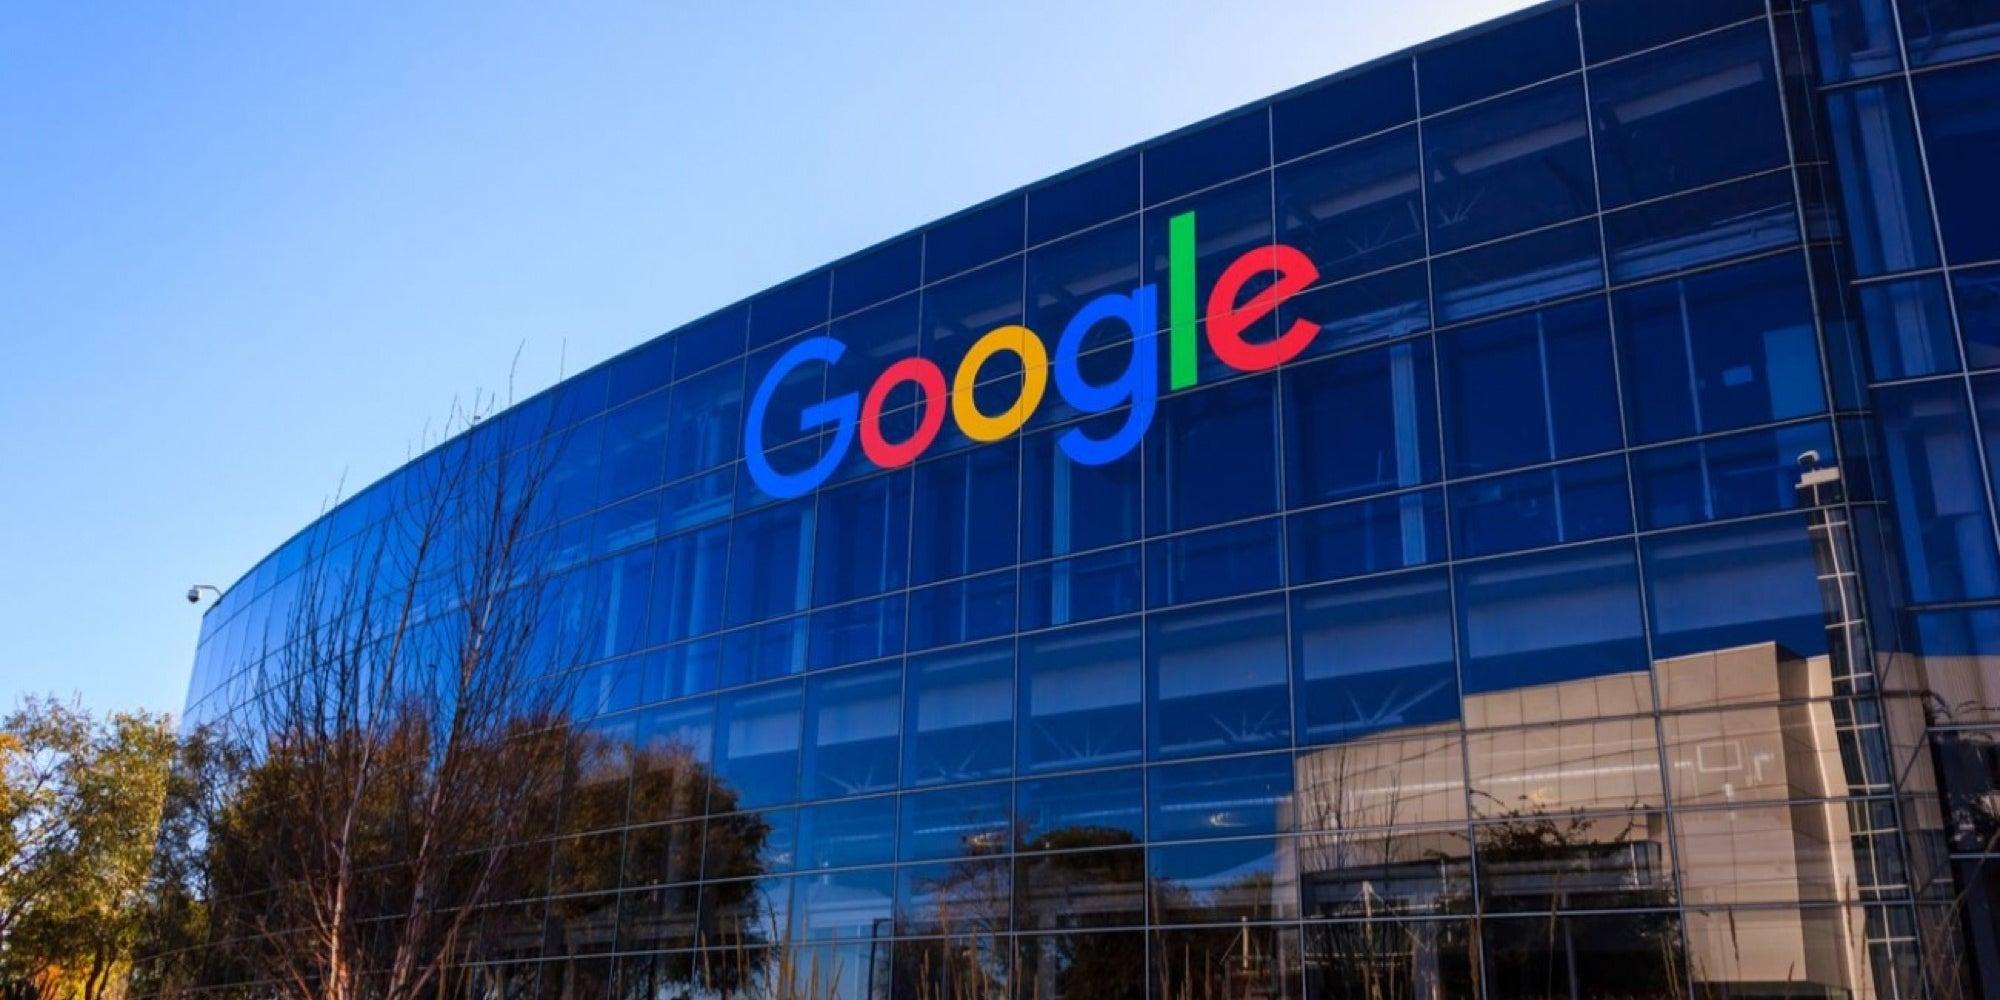 8. Google